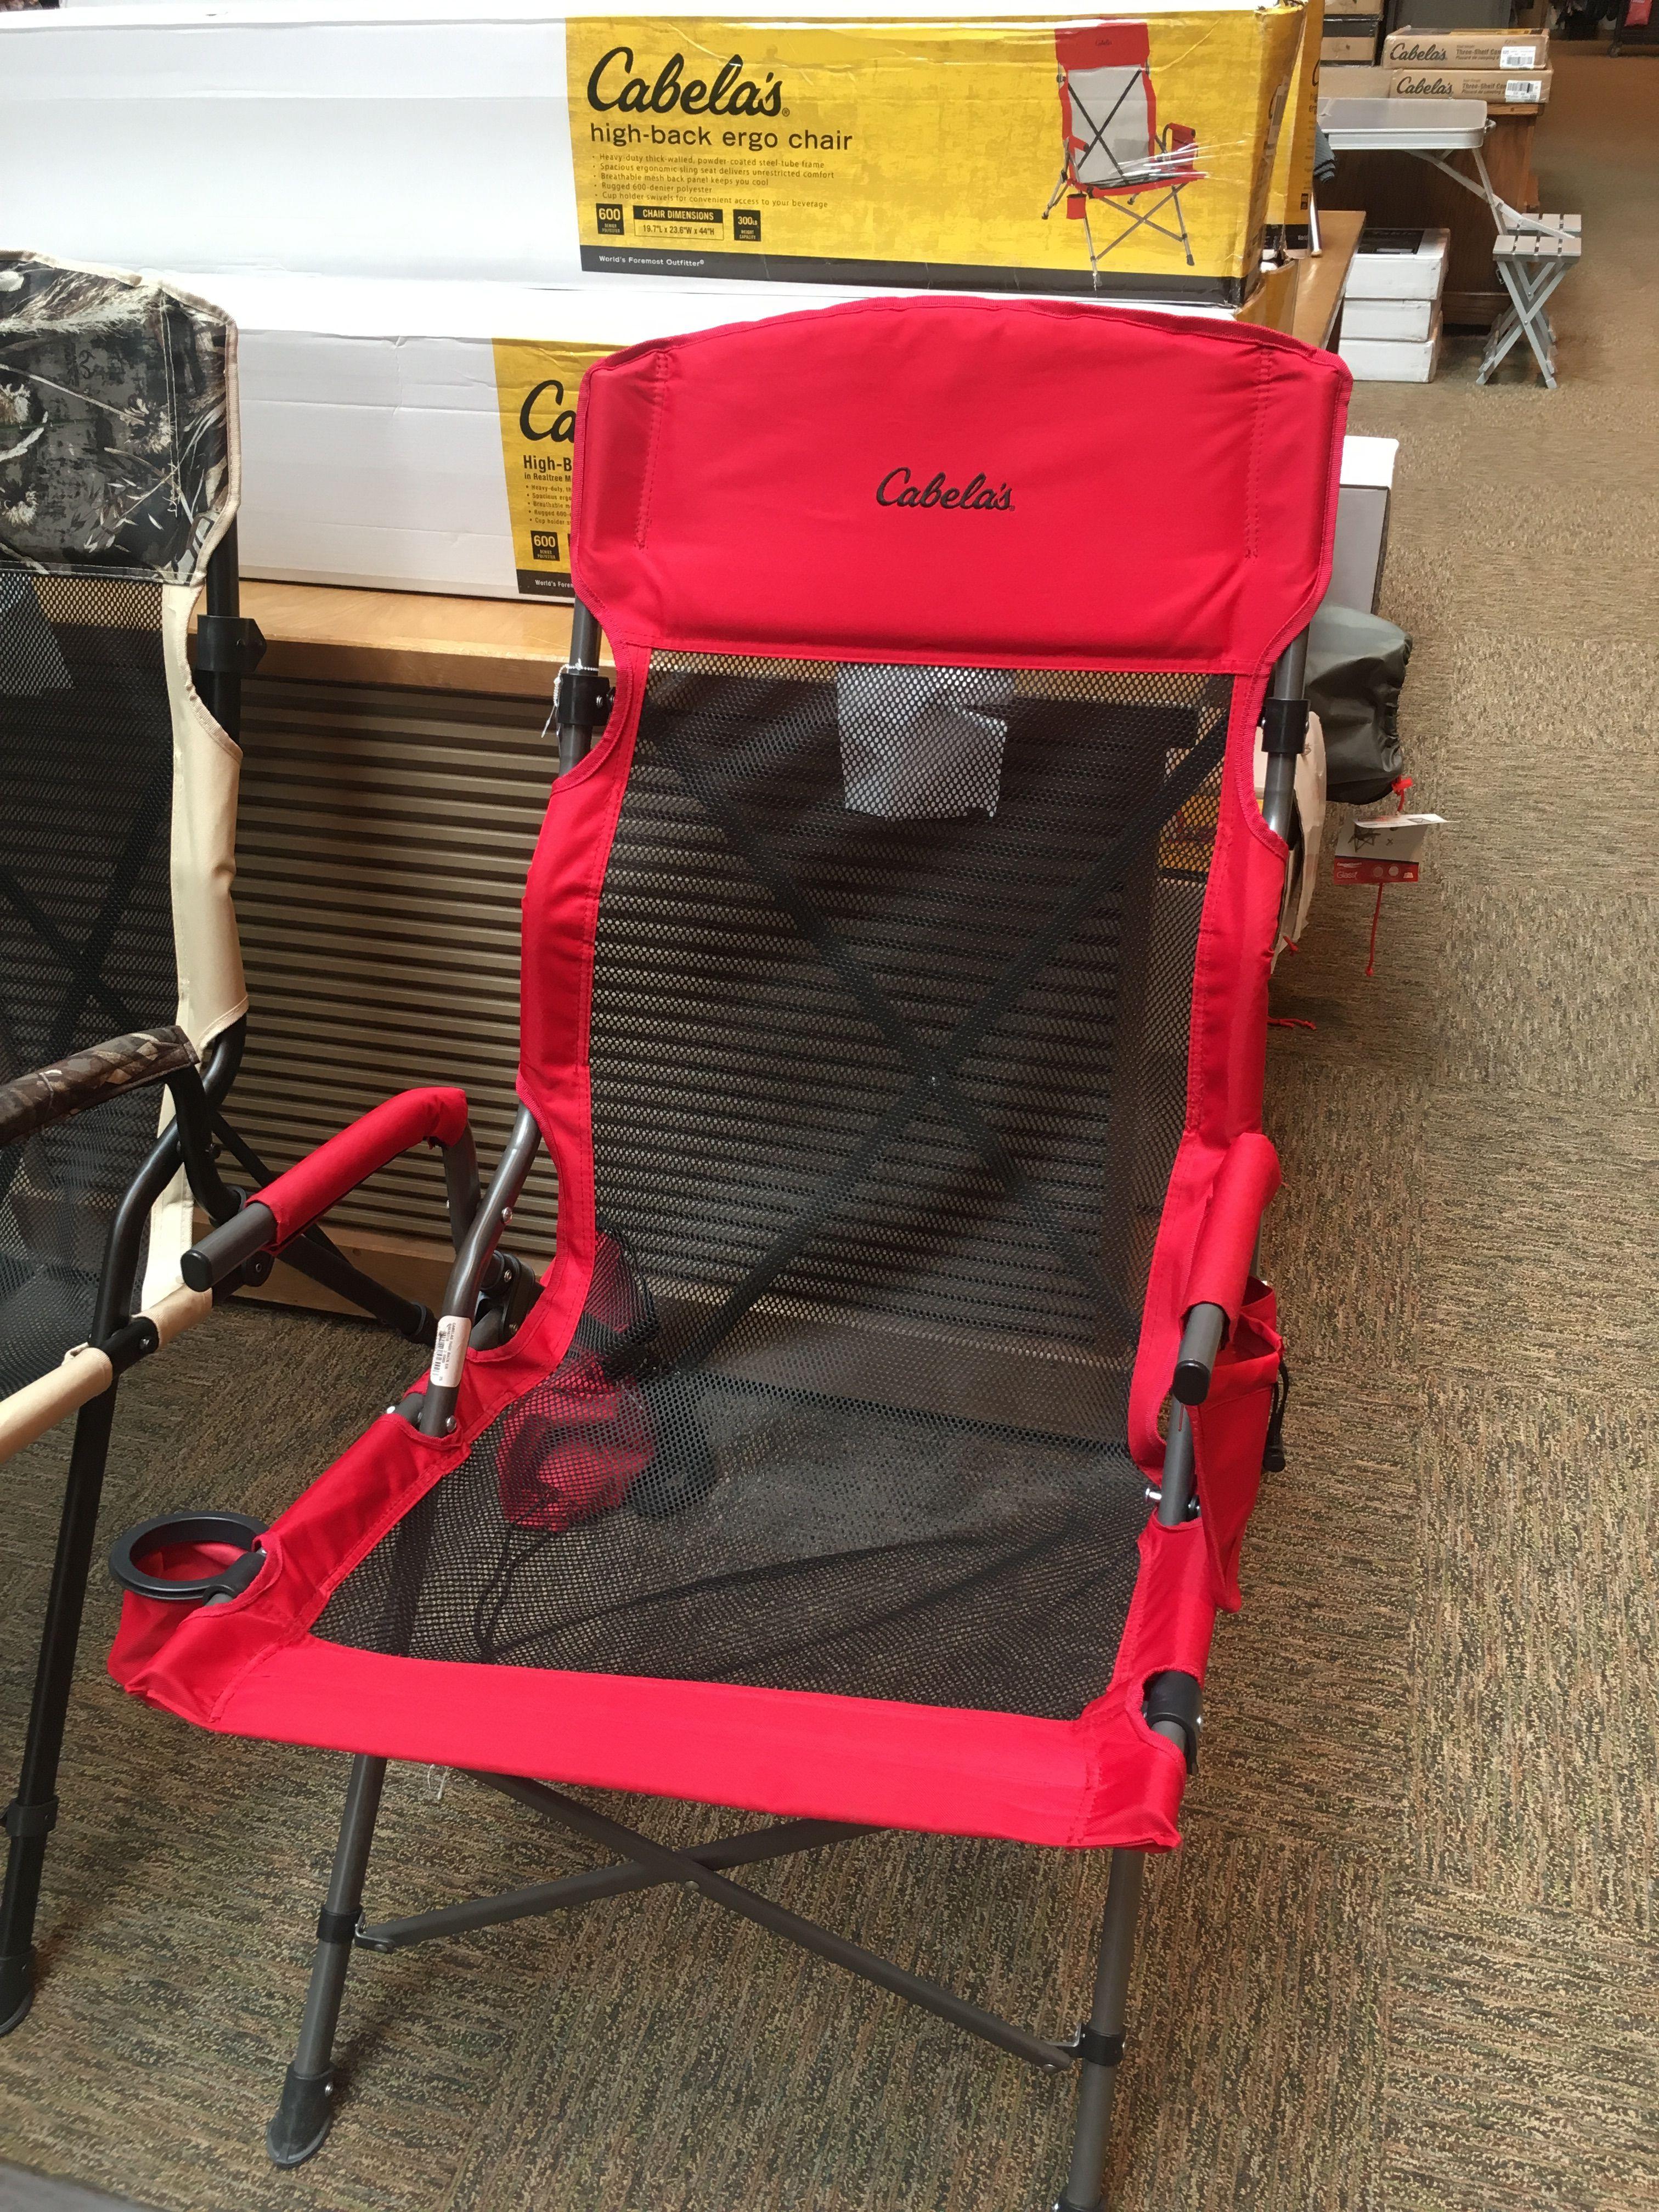 Cabelas High Back Ergo Chair 49 99 Outdoor Gear Cabelas Hunting